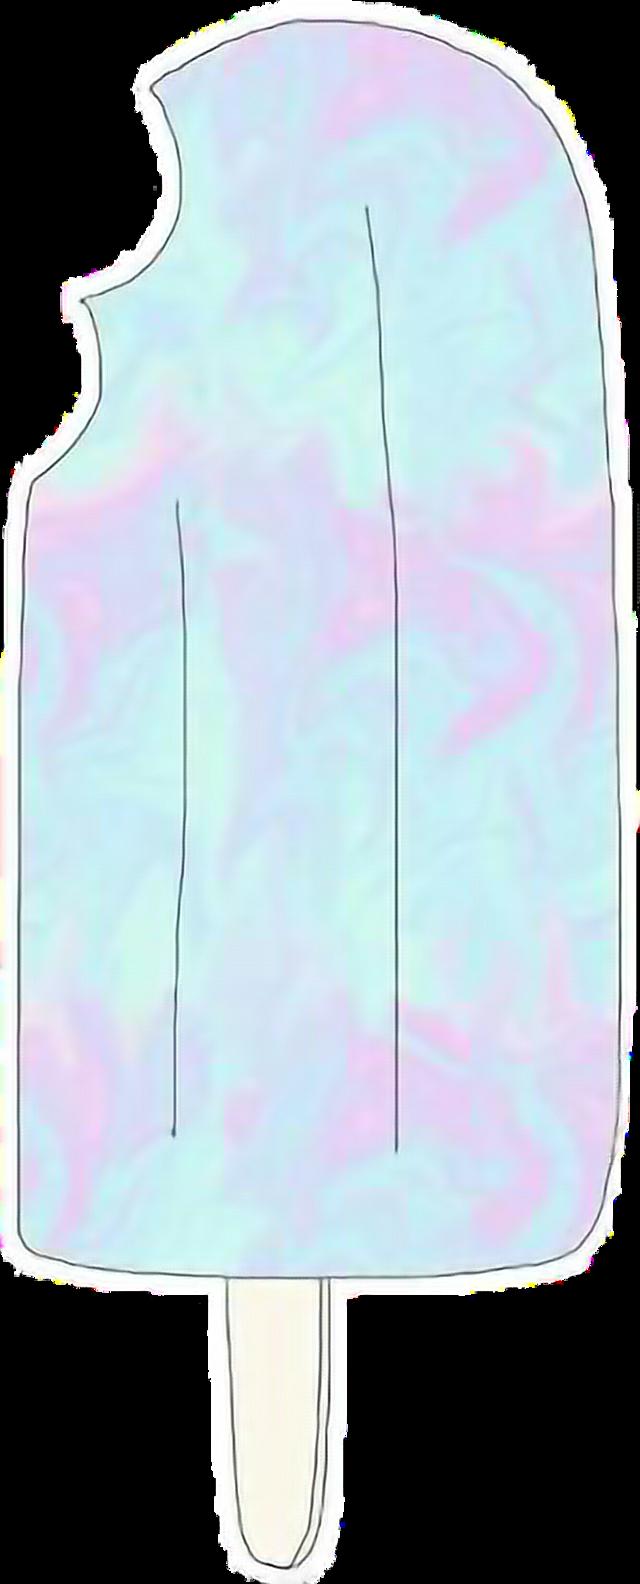 #holo #popsicle #tumblr #pastel #girlyoverlay